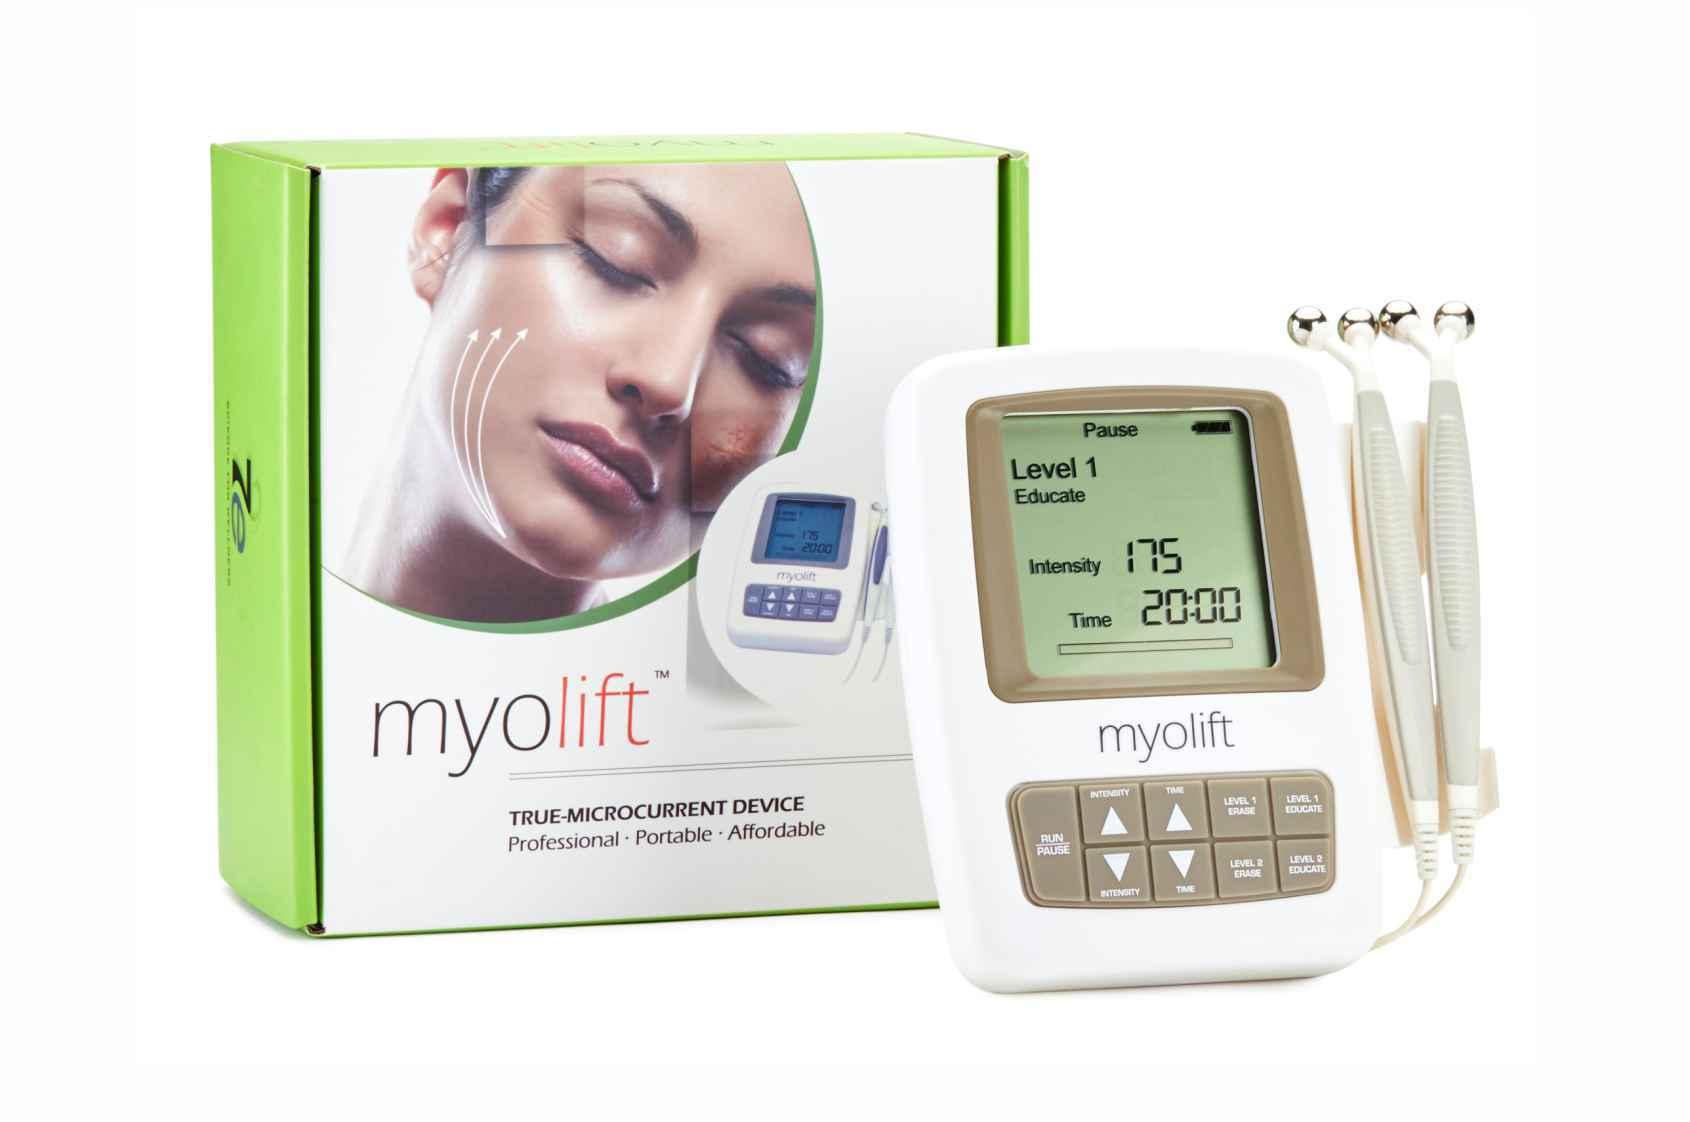 myolift most affordable microcurrent machine